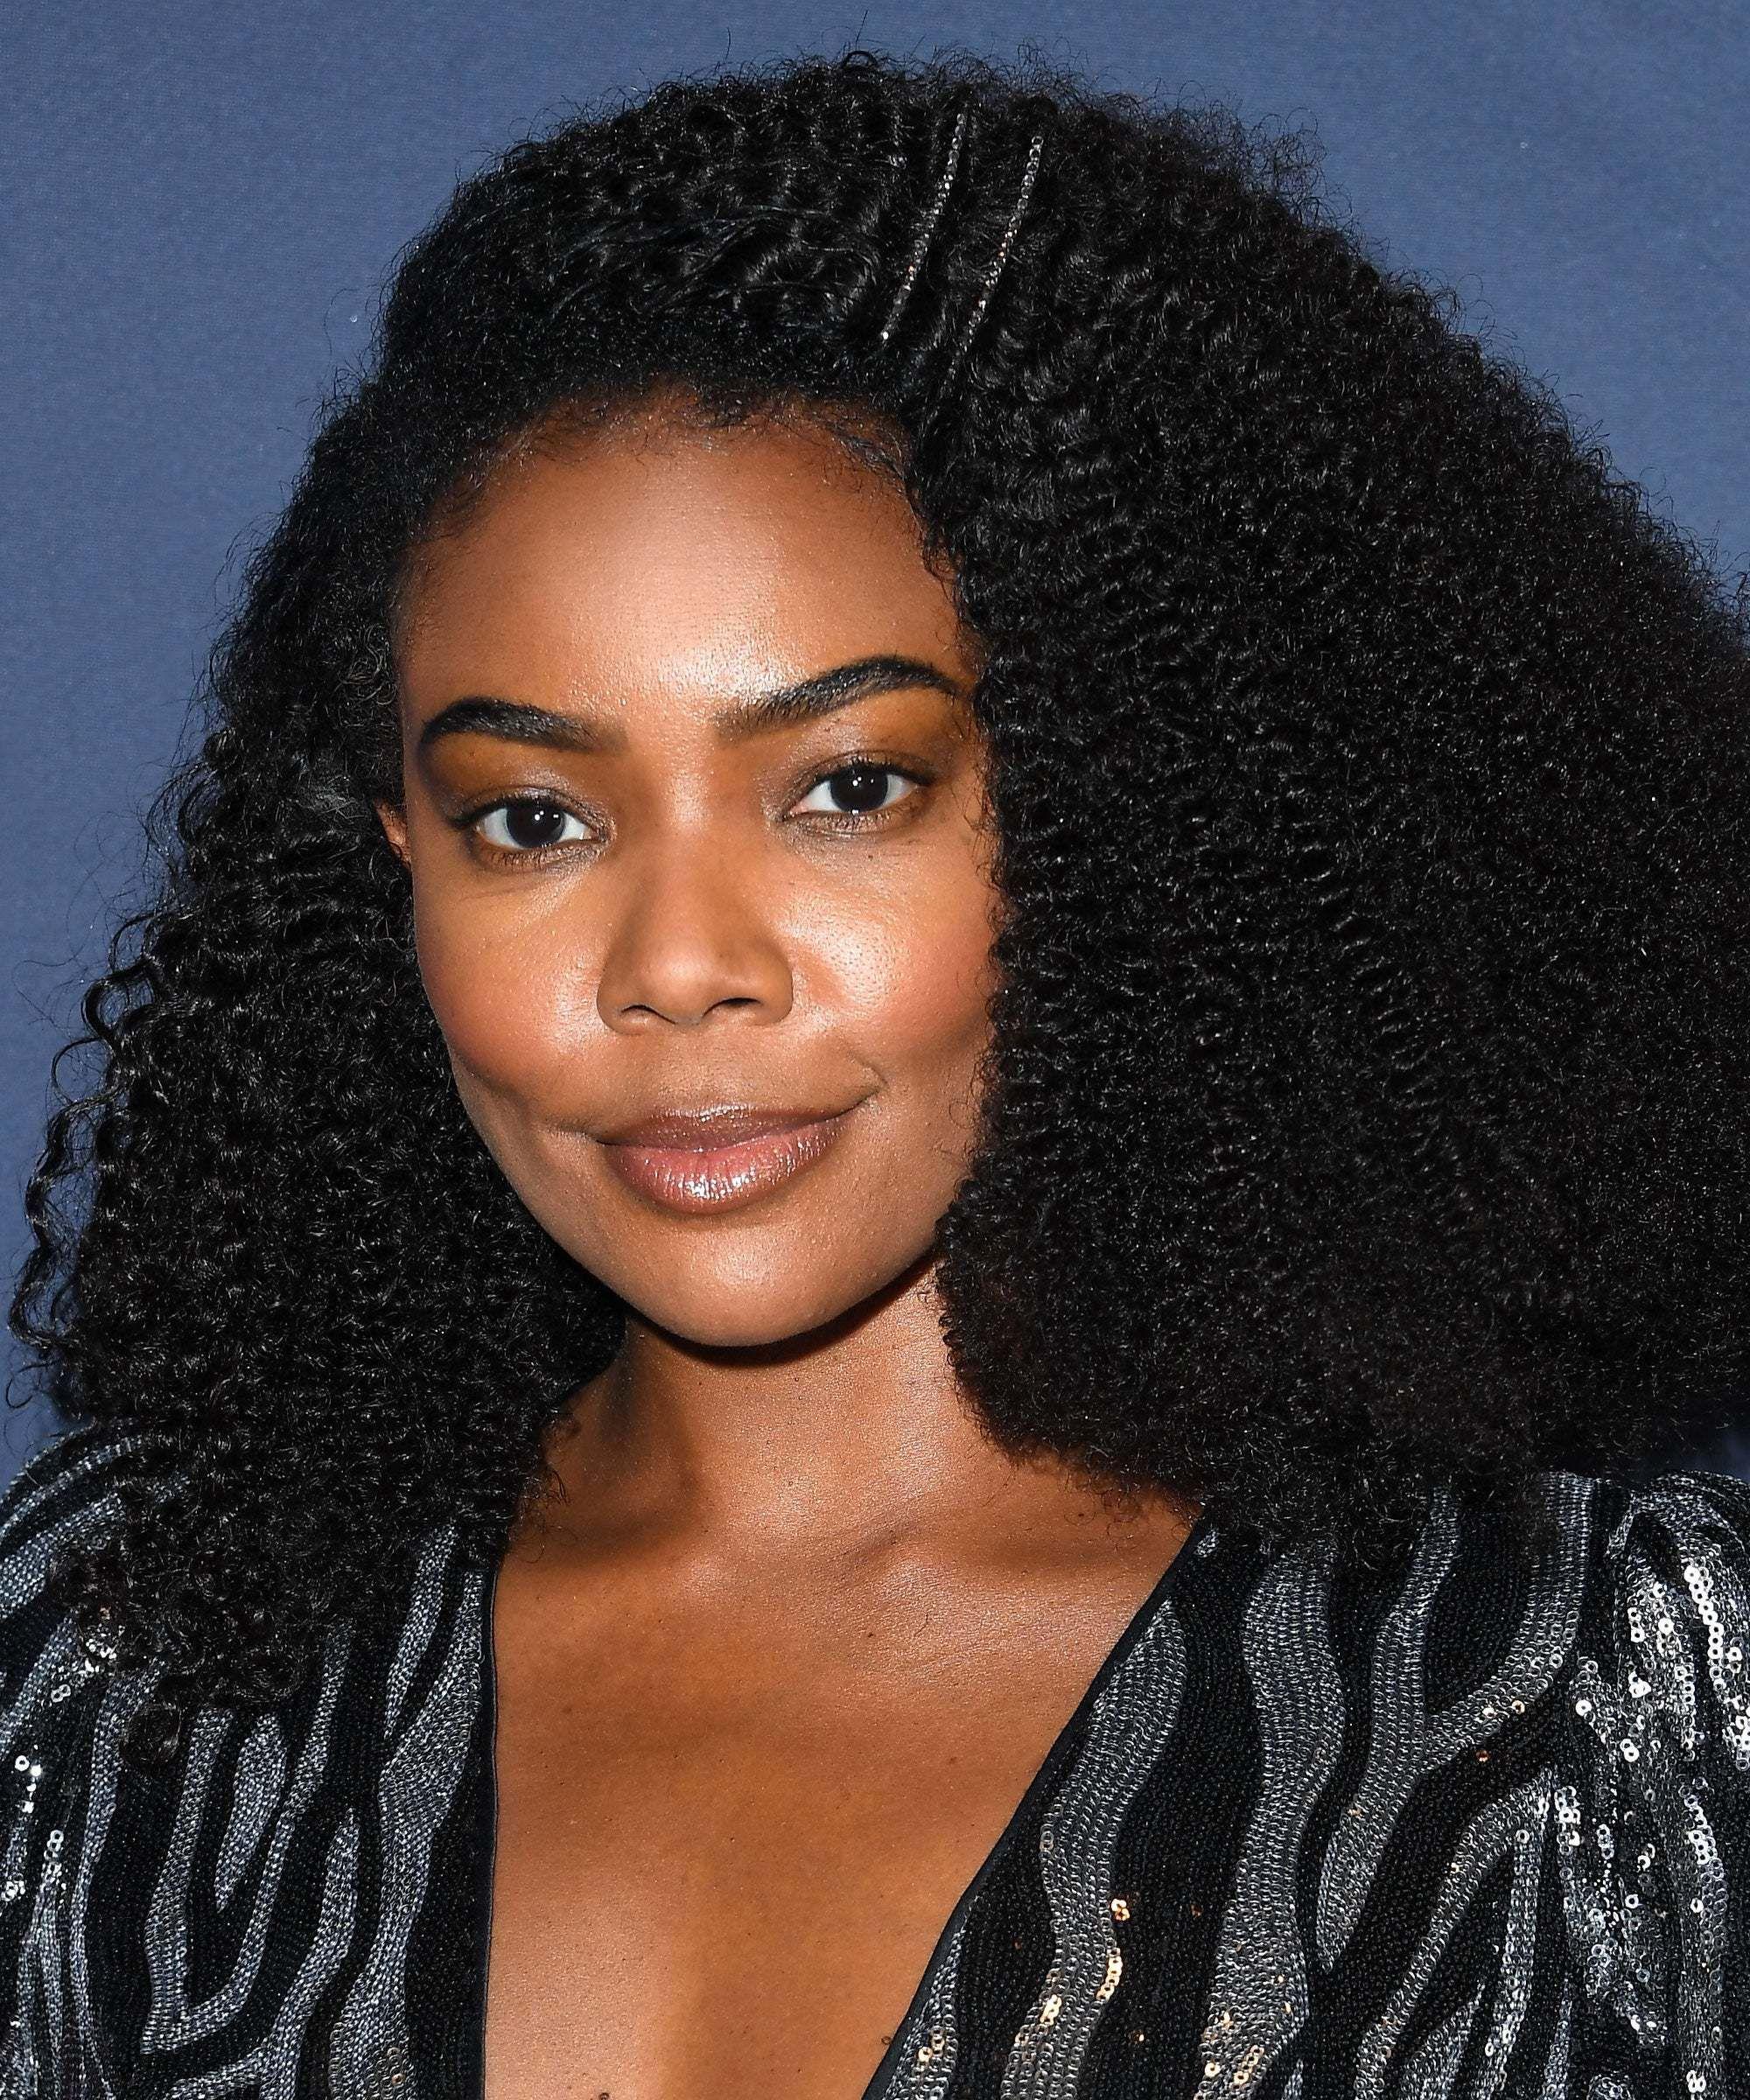 Unprofessional Hairstyles Women Womens Hairstyles Hair Styles Braided Hairstyles For Black Women